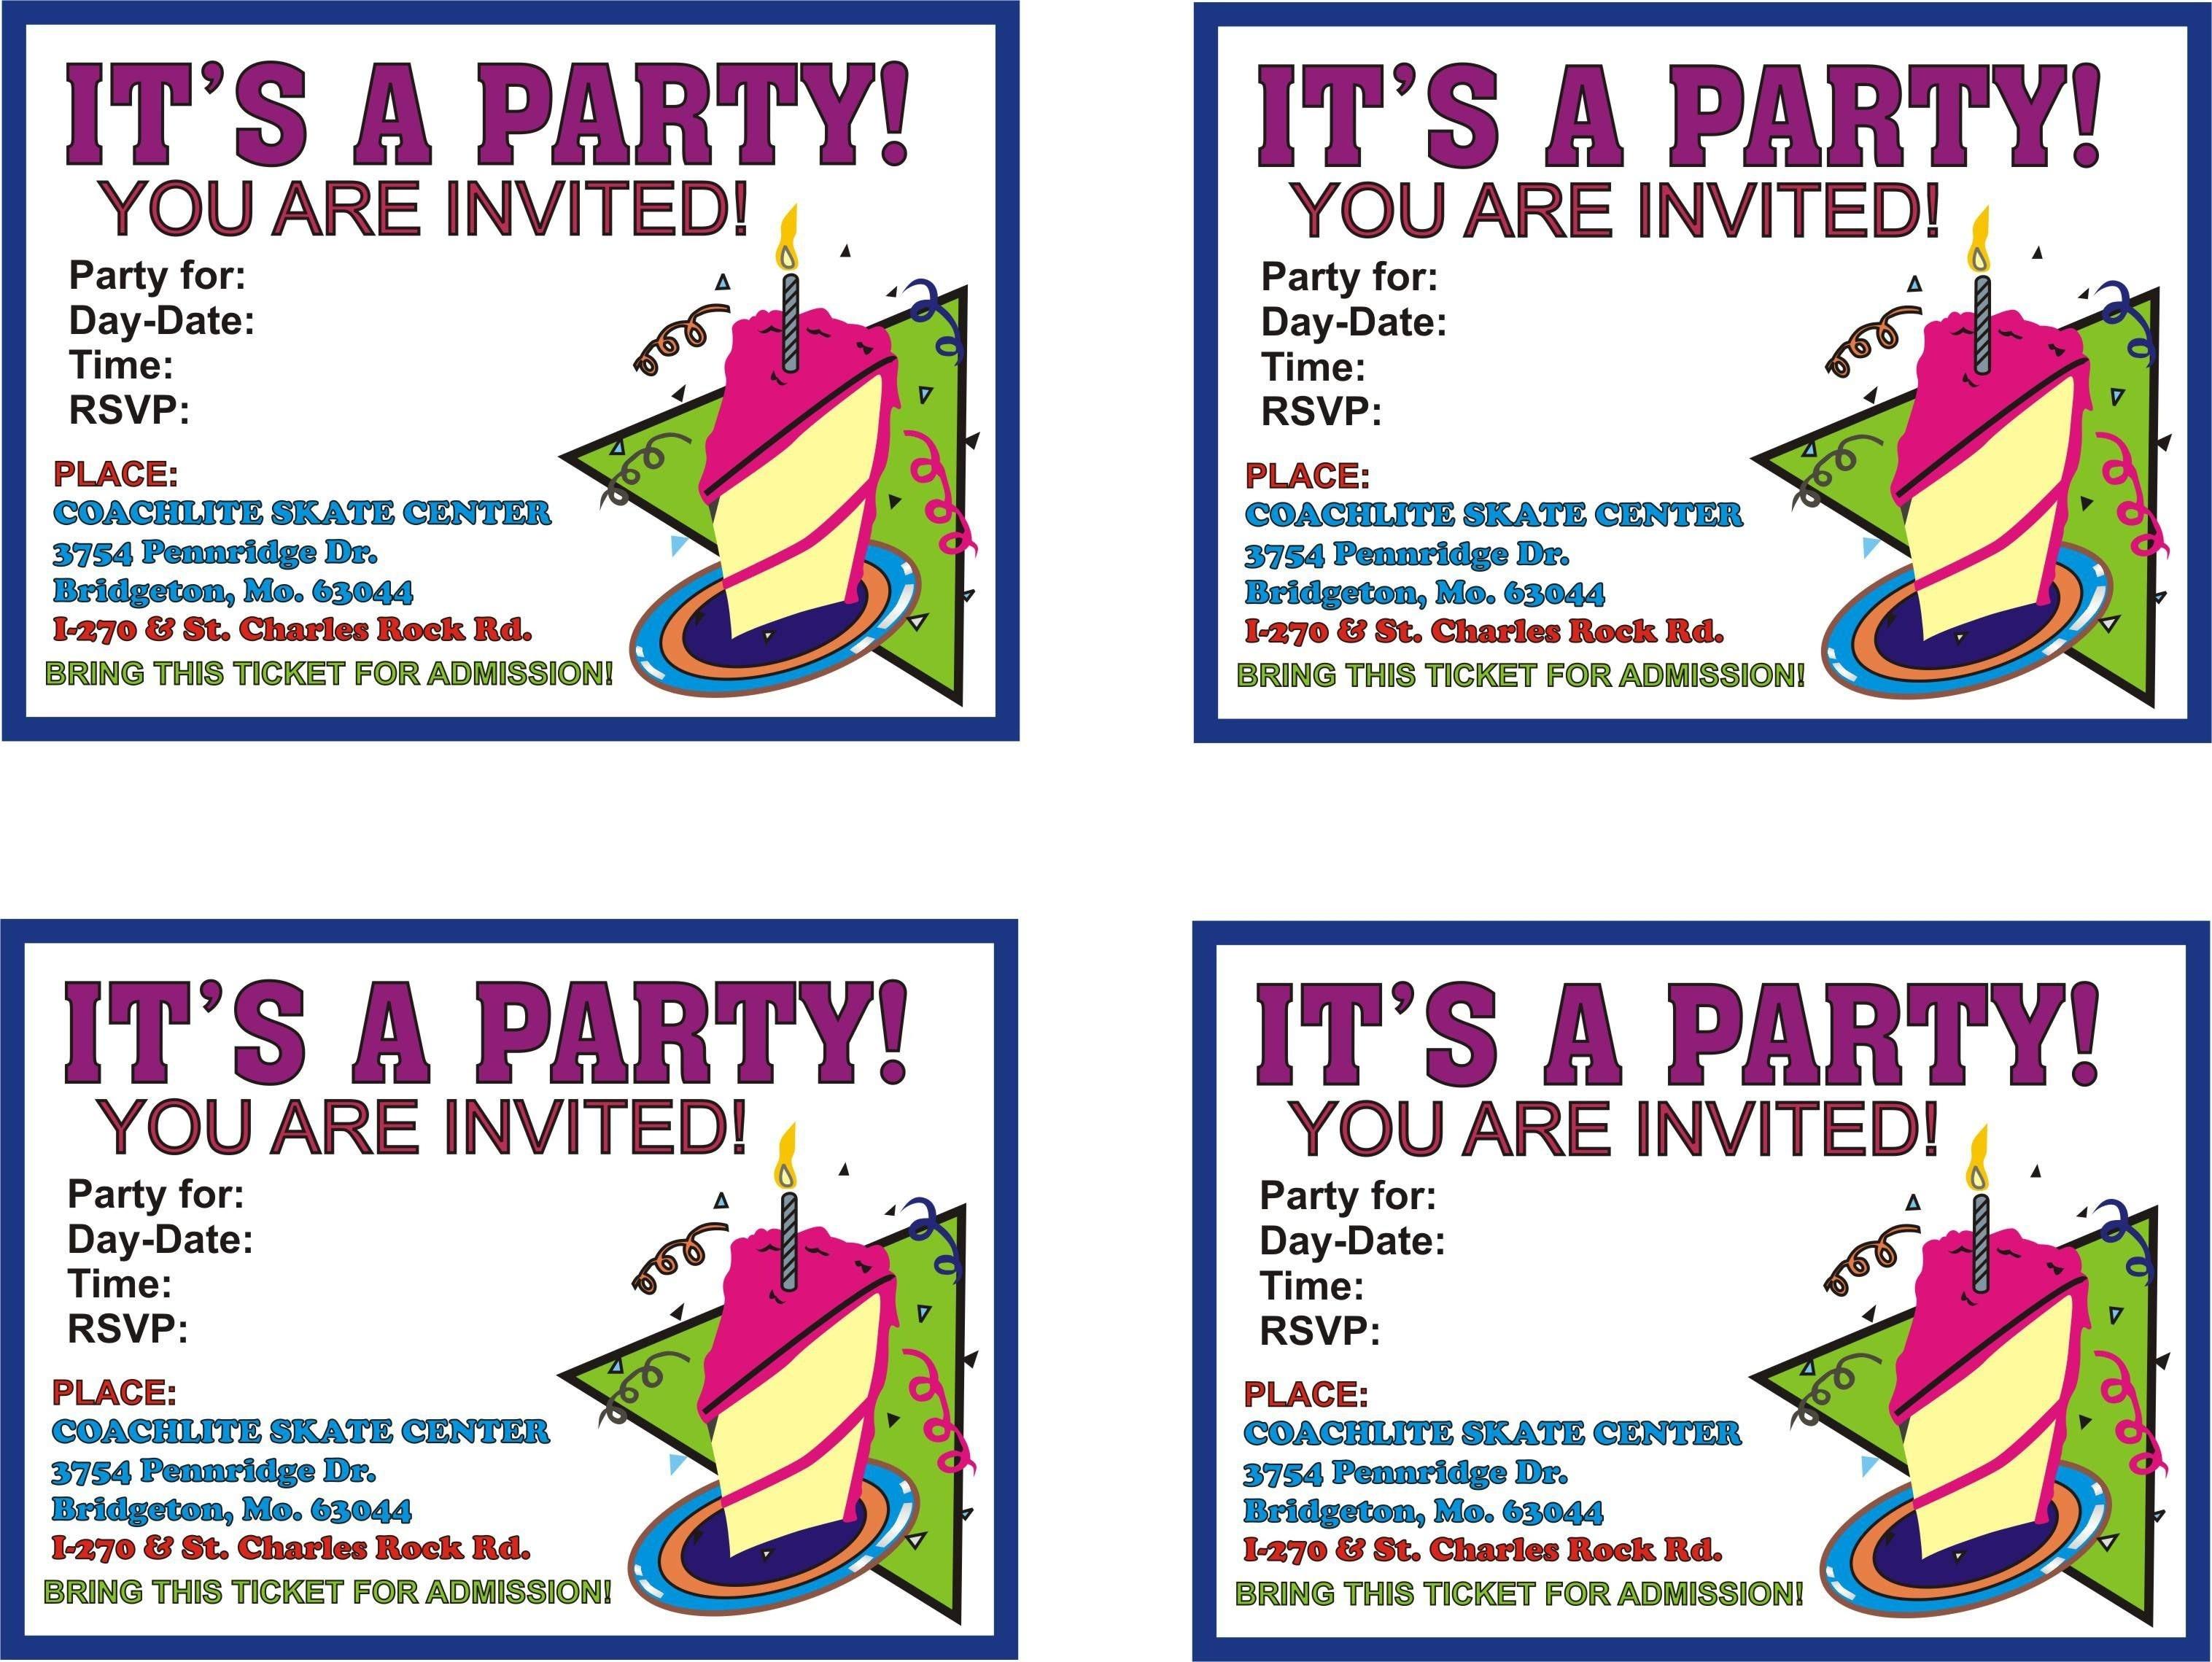 Free Online Printable Birthday Party Invitations | Lazine - 13Th Birthday Party Invitations Printable Free